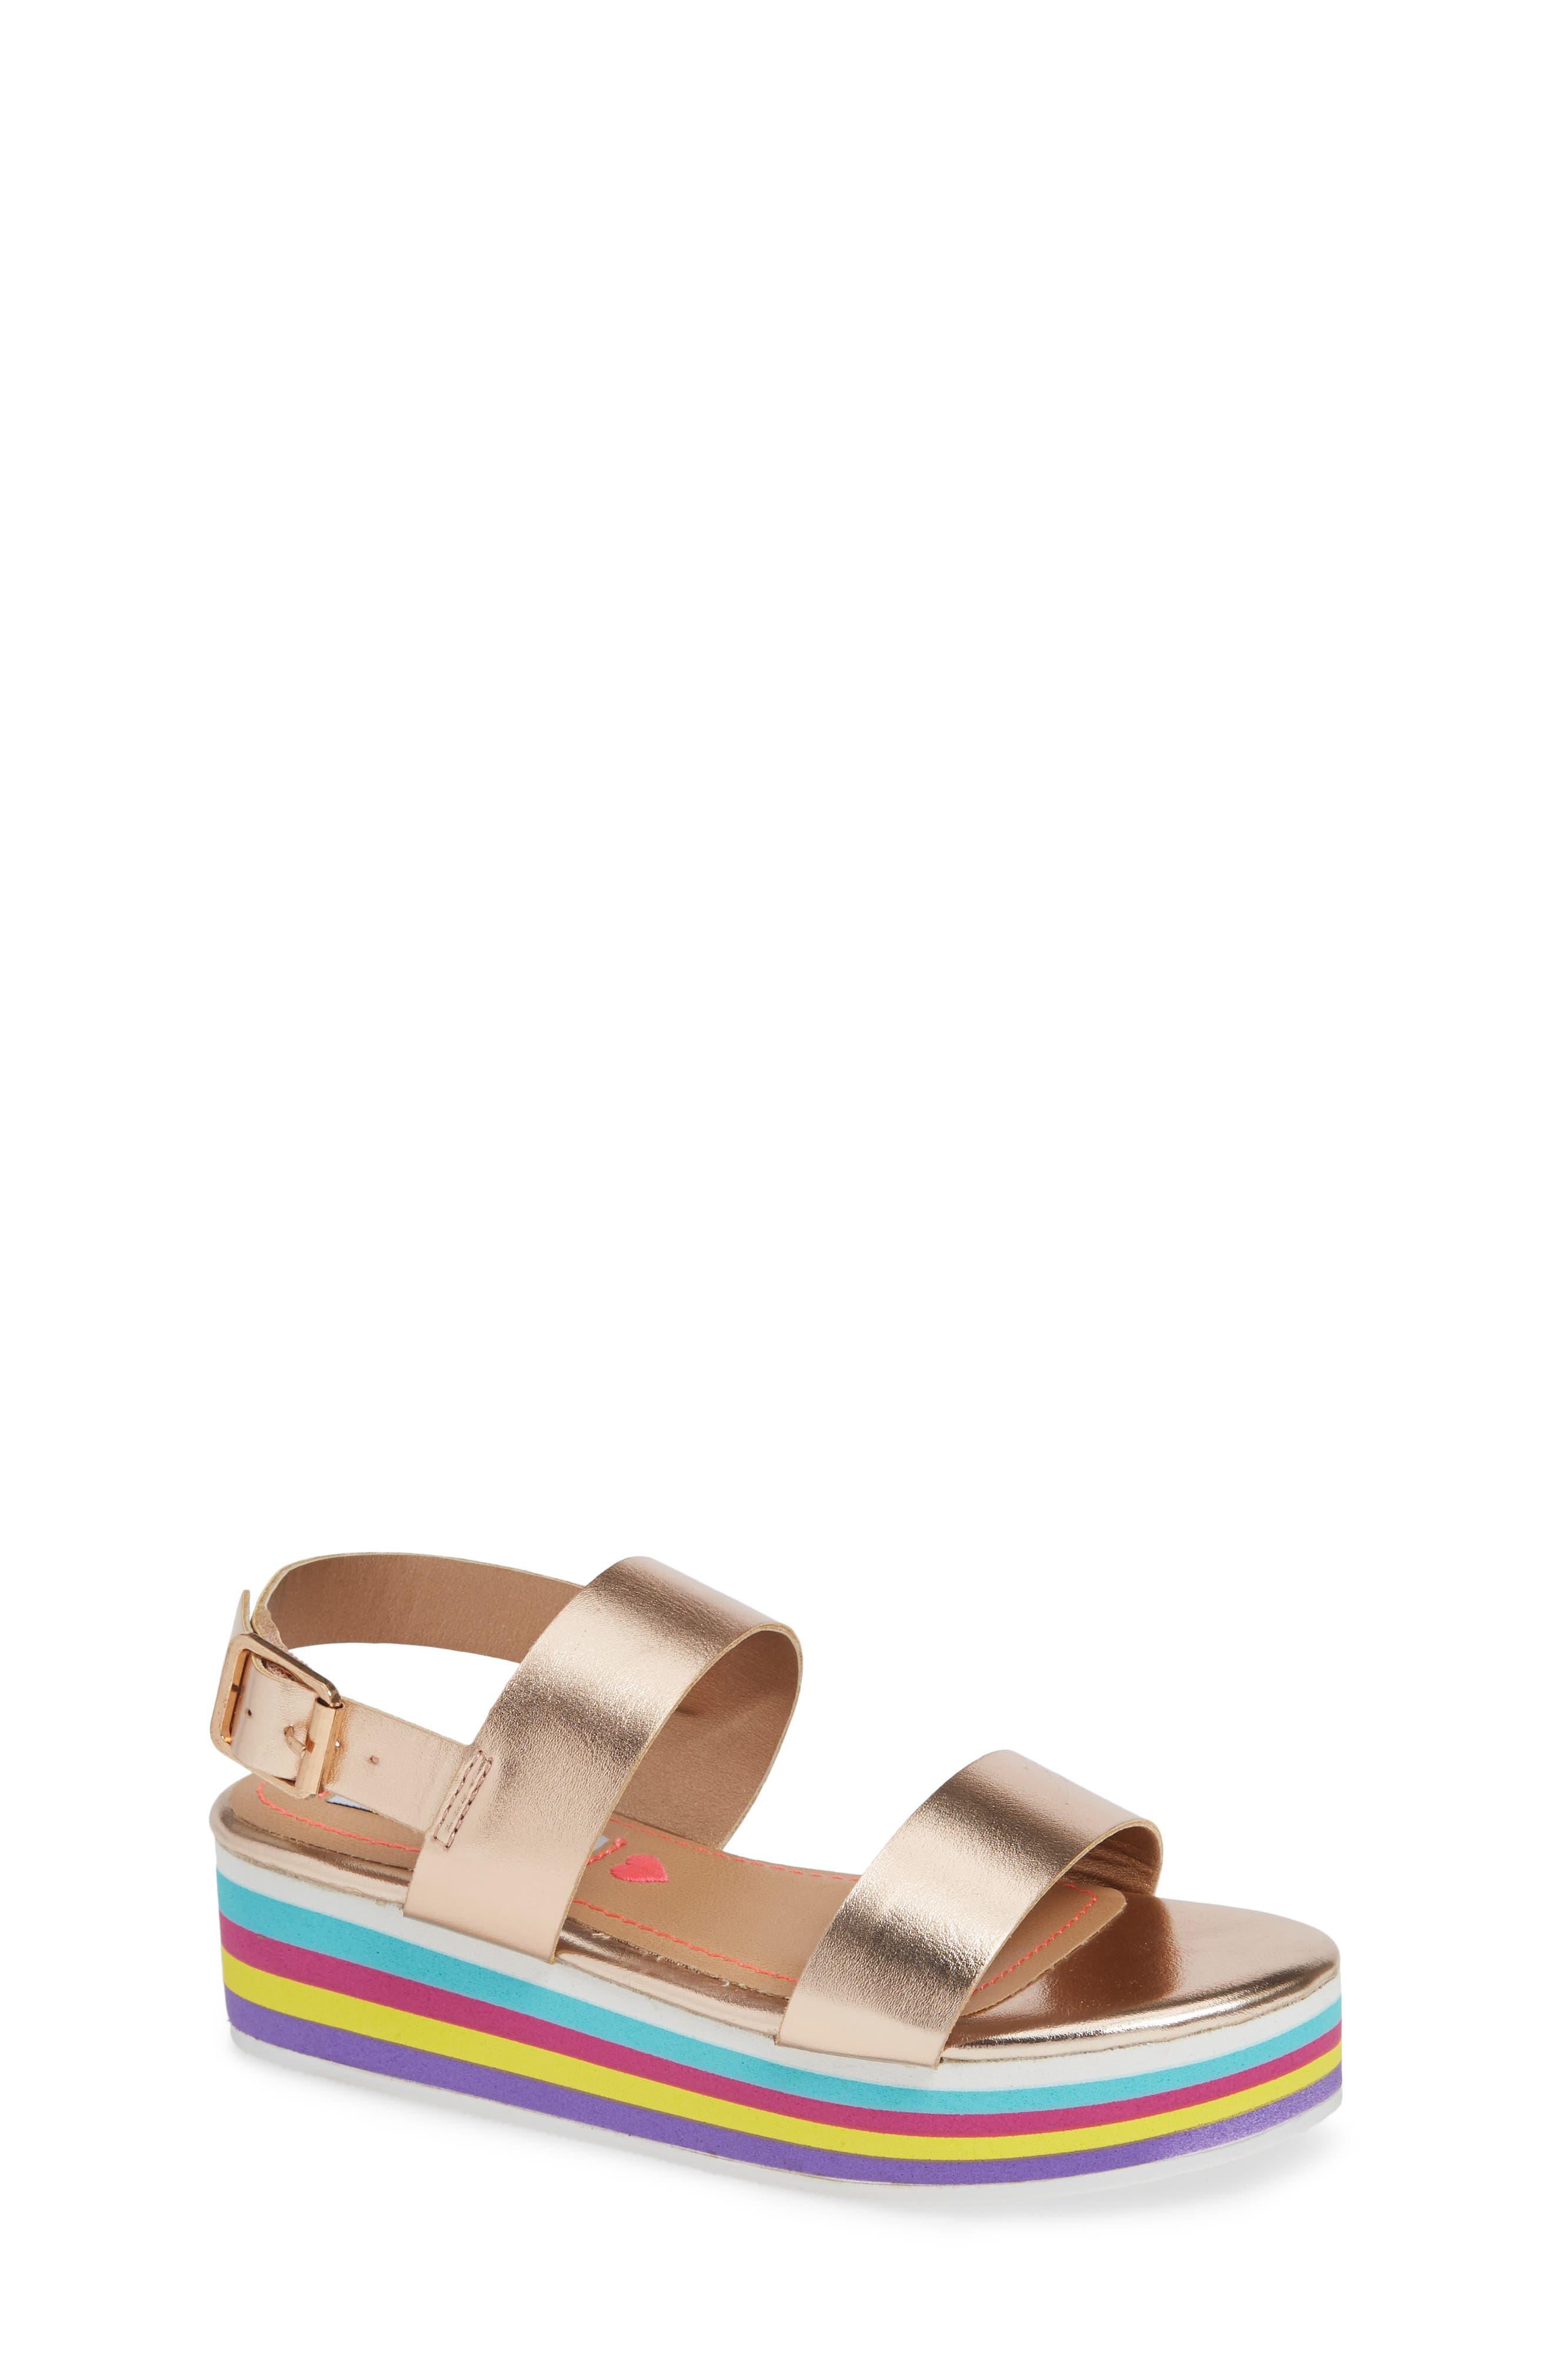 JKylie Platform Sandal,                             Main thumbnail 1, color,                             ROSE GOLD